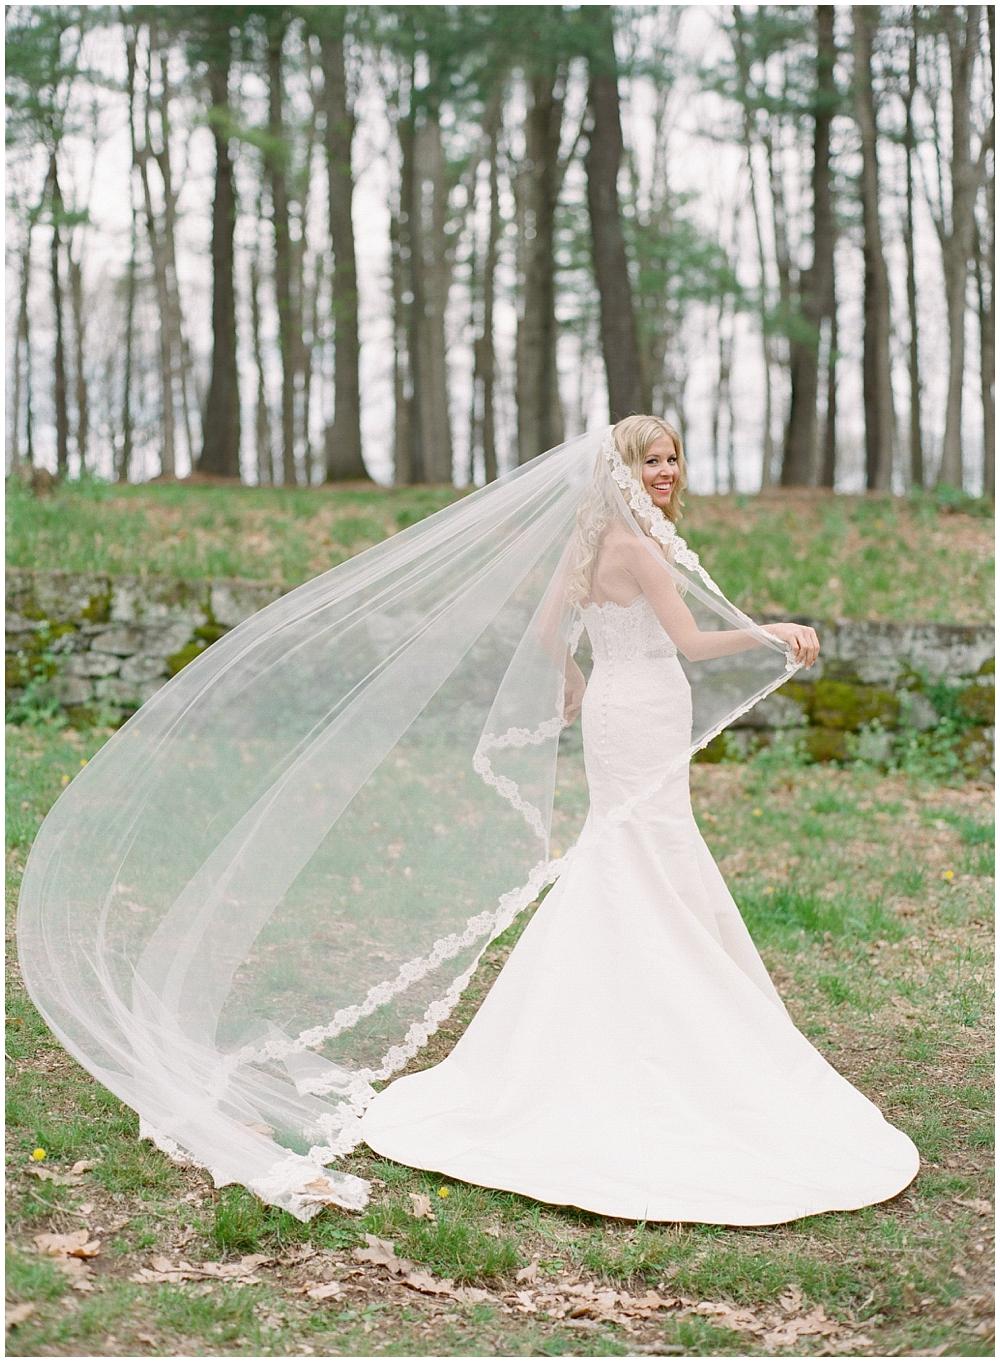 wadsworth-mansion-wedding-photographer-3